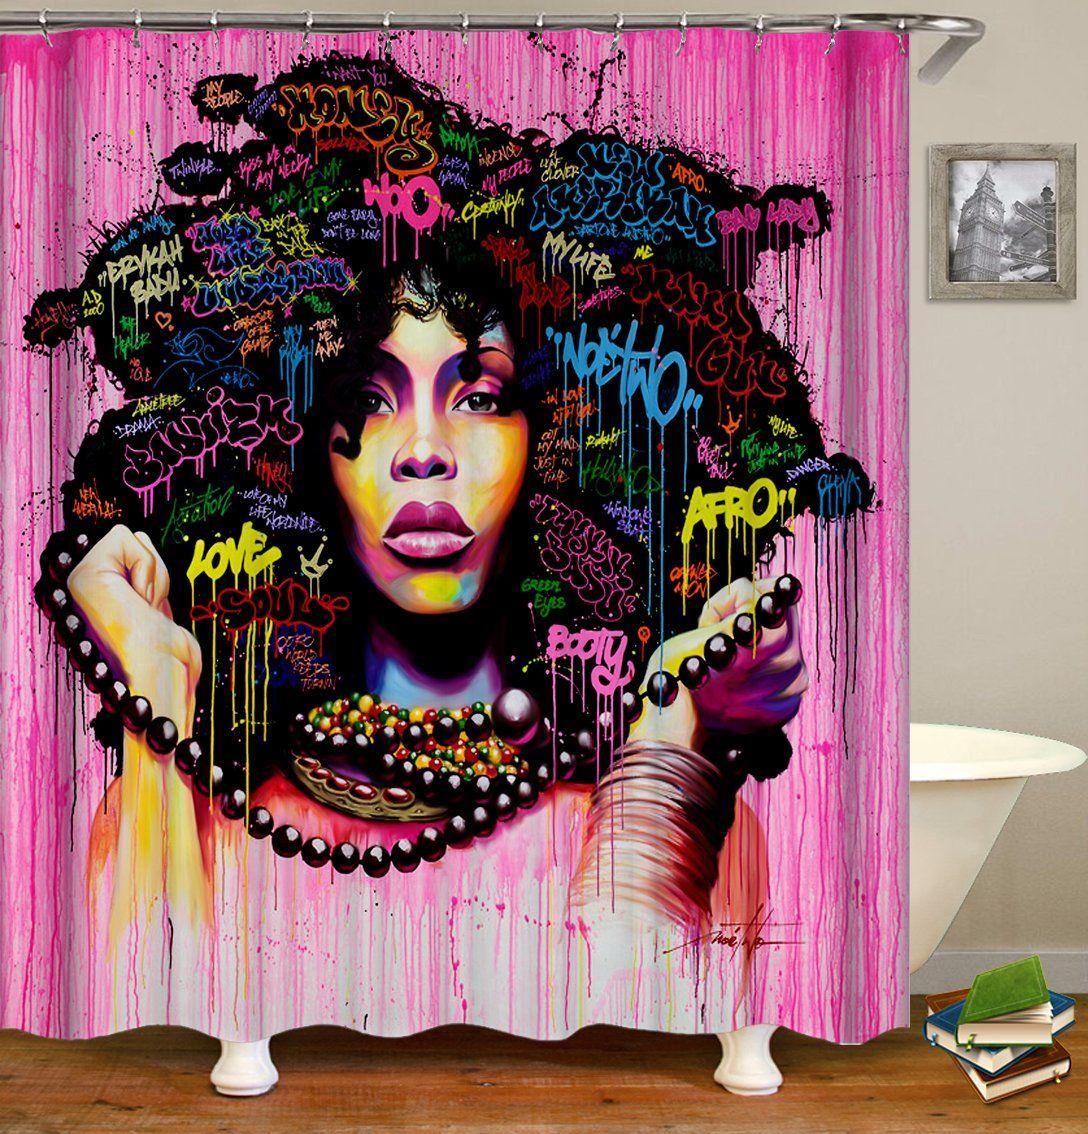 Baduizm Fine Black Women Hairstyle Shower Curtain Bathroom Decor